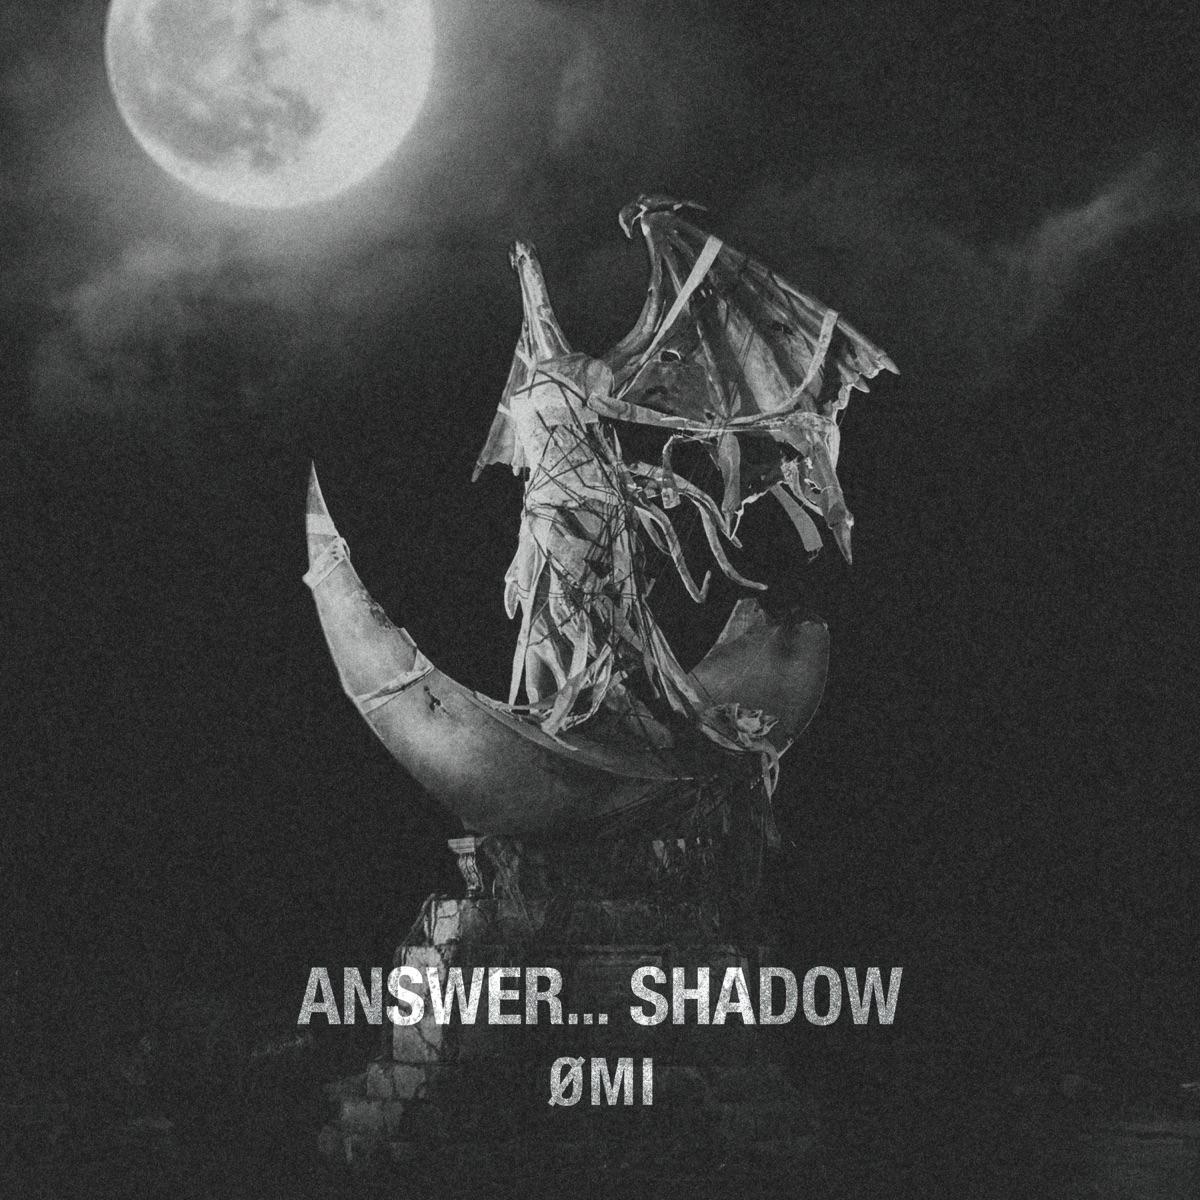 『ØMI - Give up』収録の『ANSWER... SHADOW』ジャケット